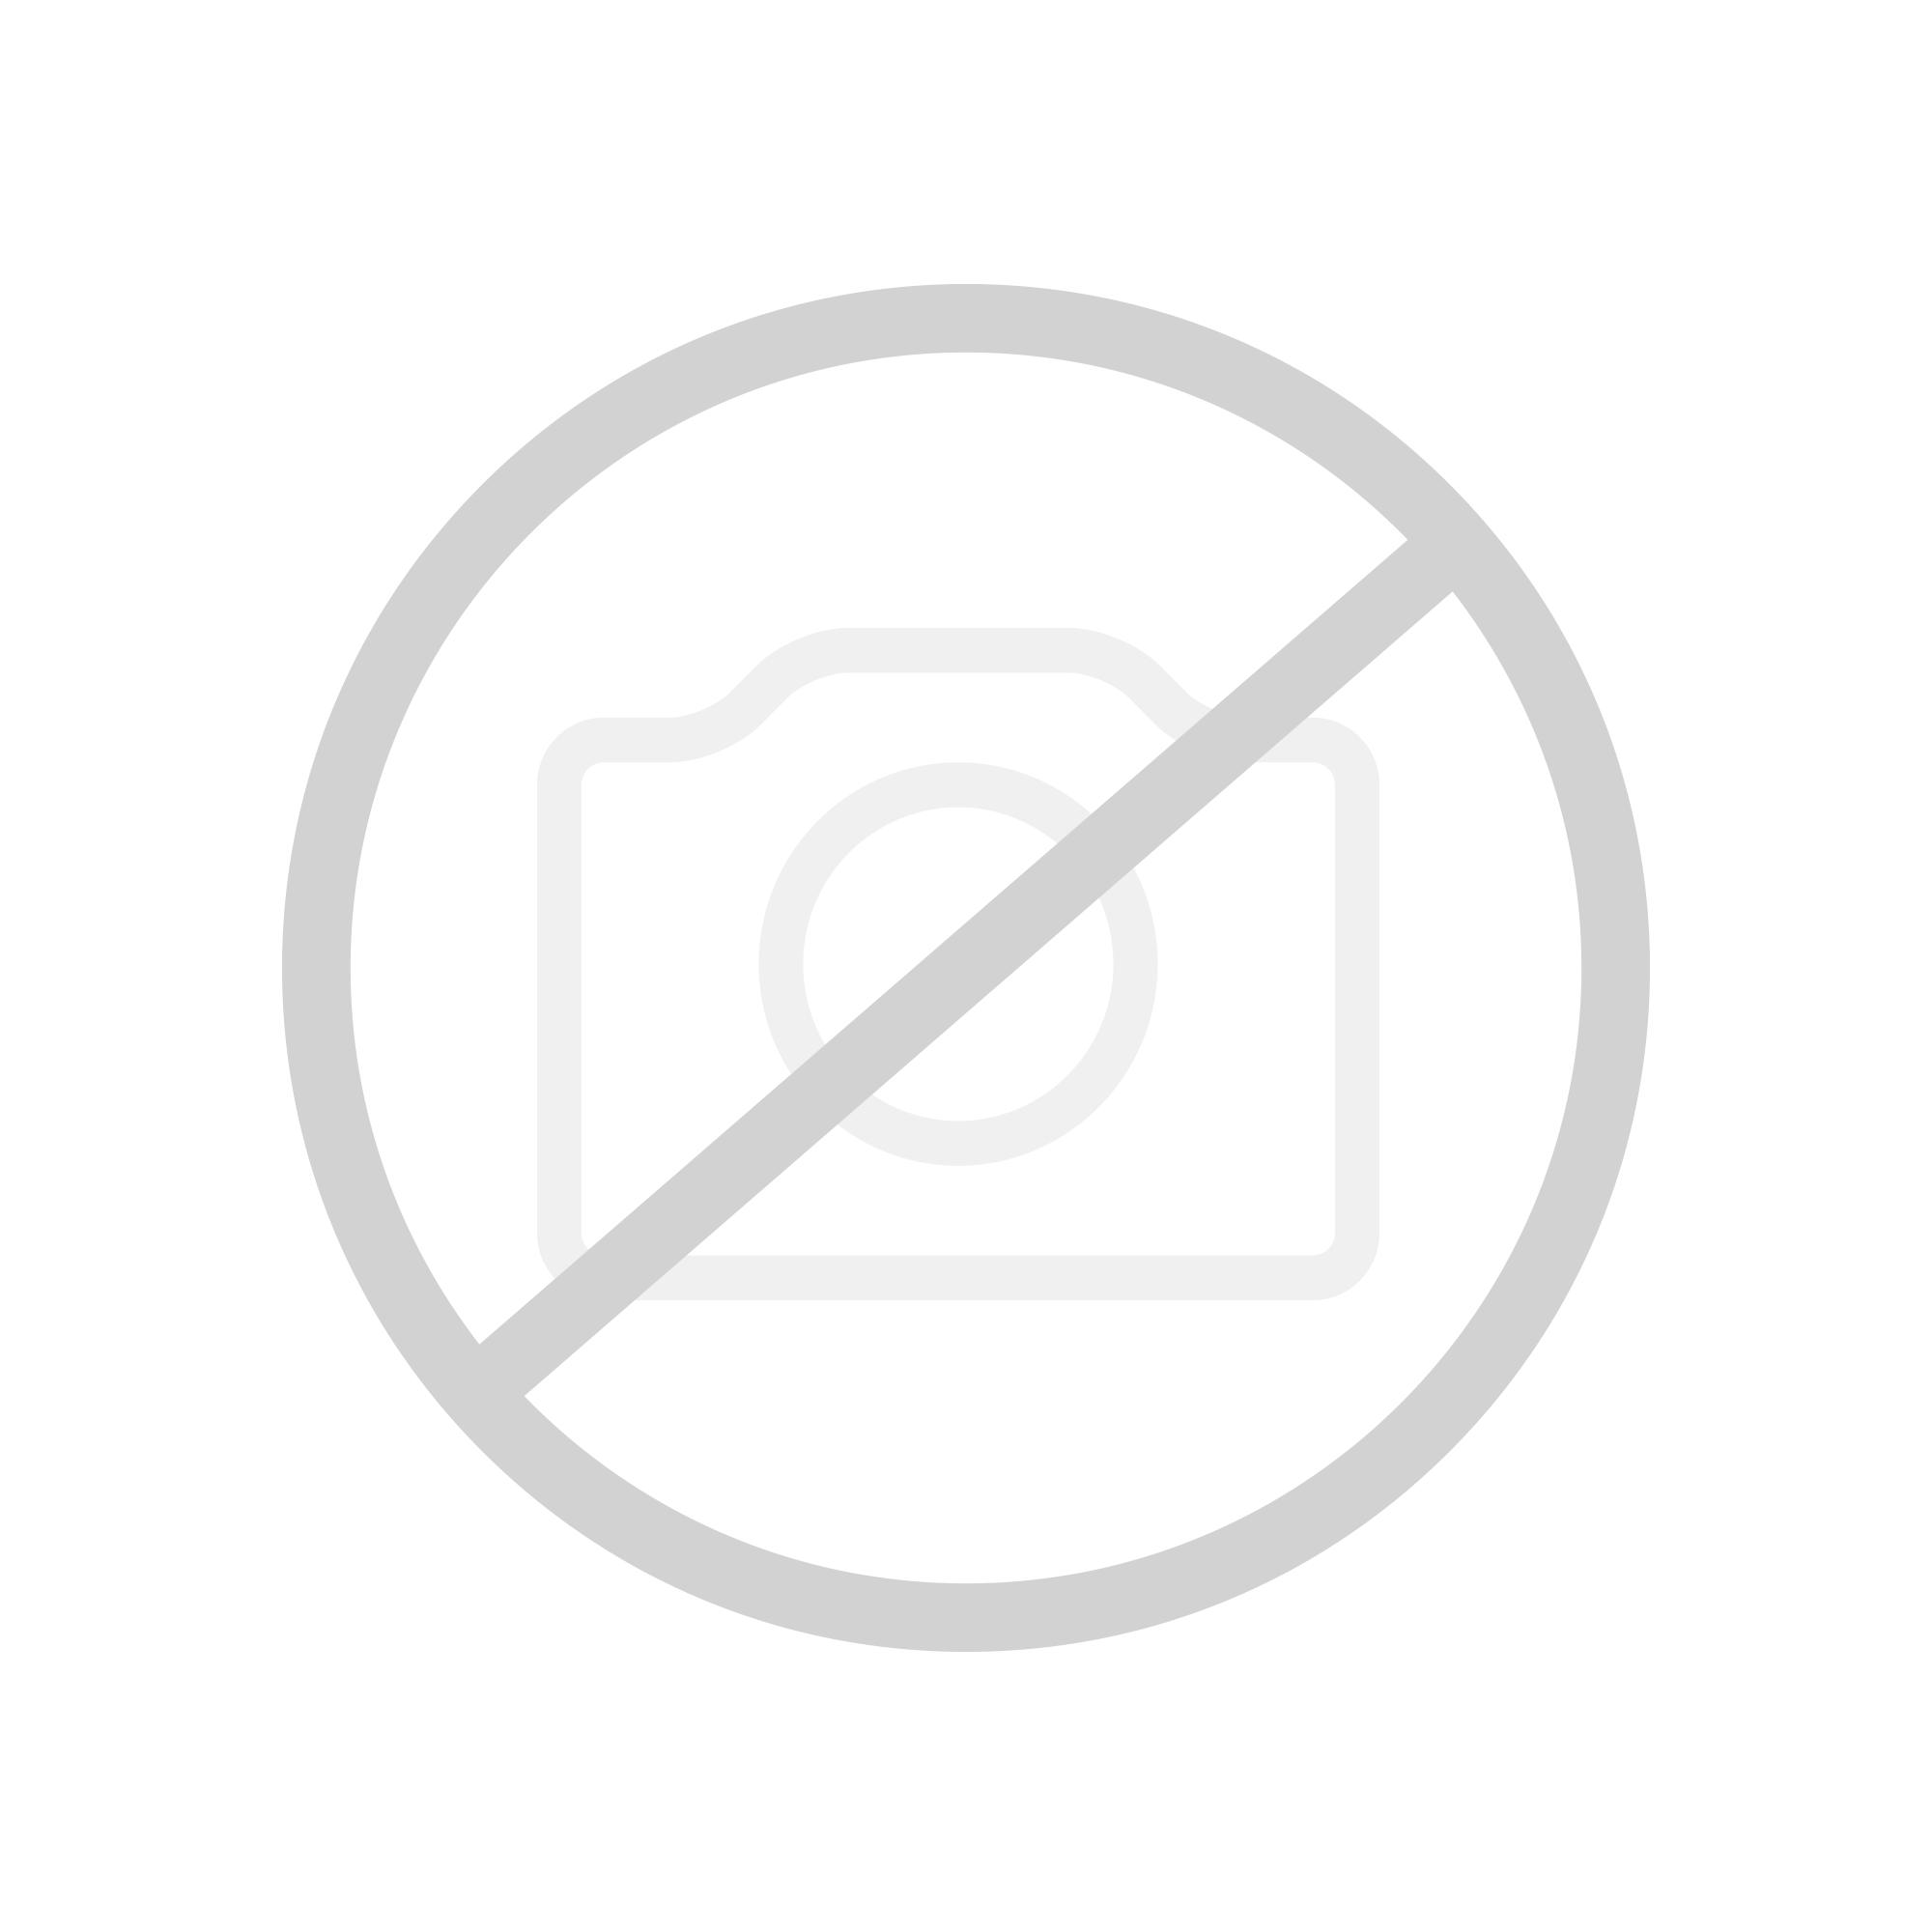 Tellkamp Easy freistehende Oval Badewanne L:170 B: 80 H: 60 cm